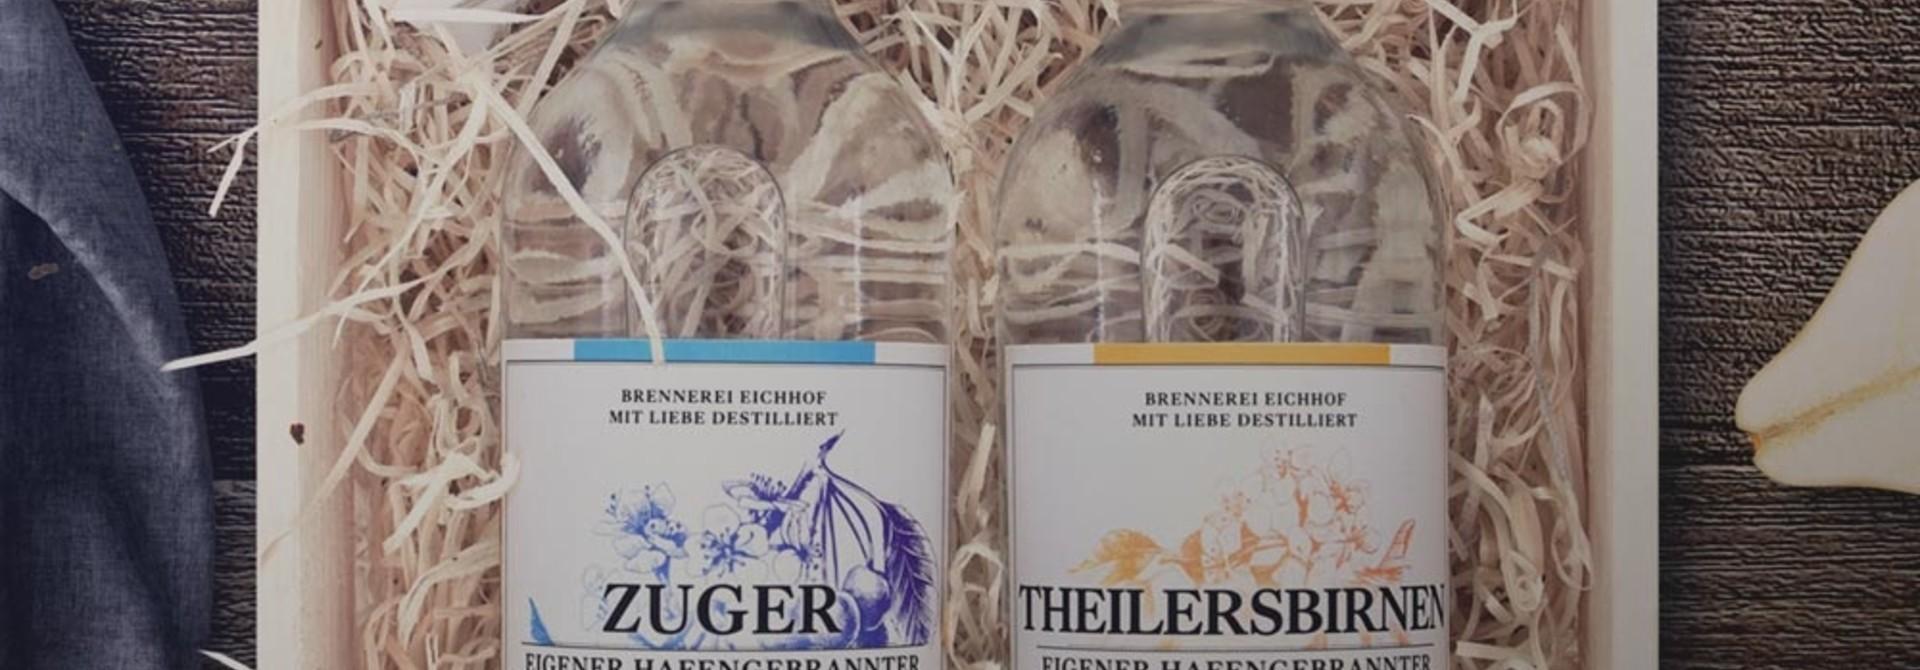 Zuger Kirsch & Theilersbirnen Träsch 70cl in Harasse